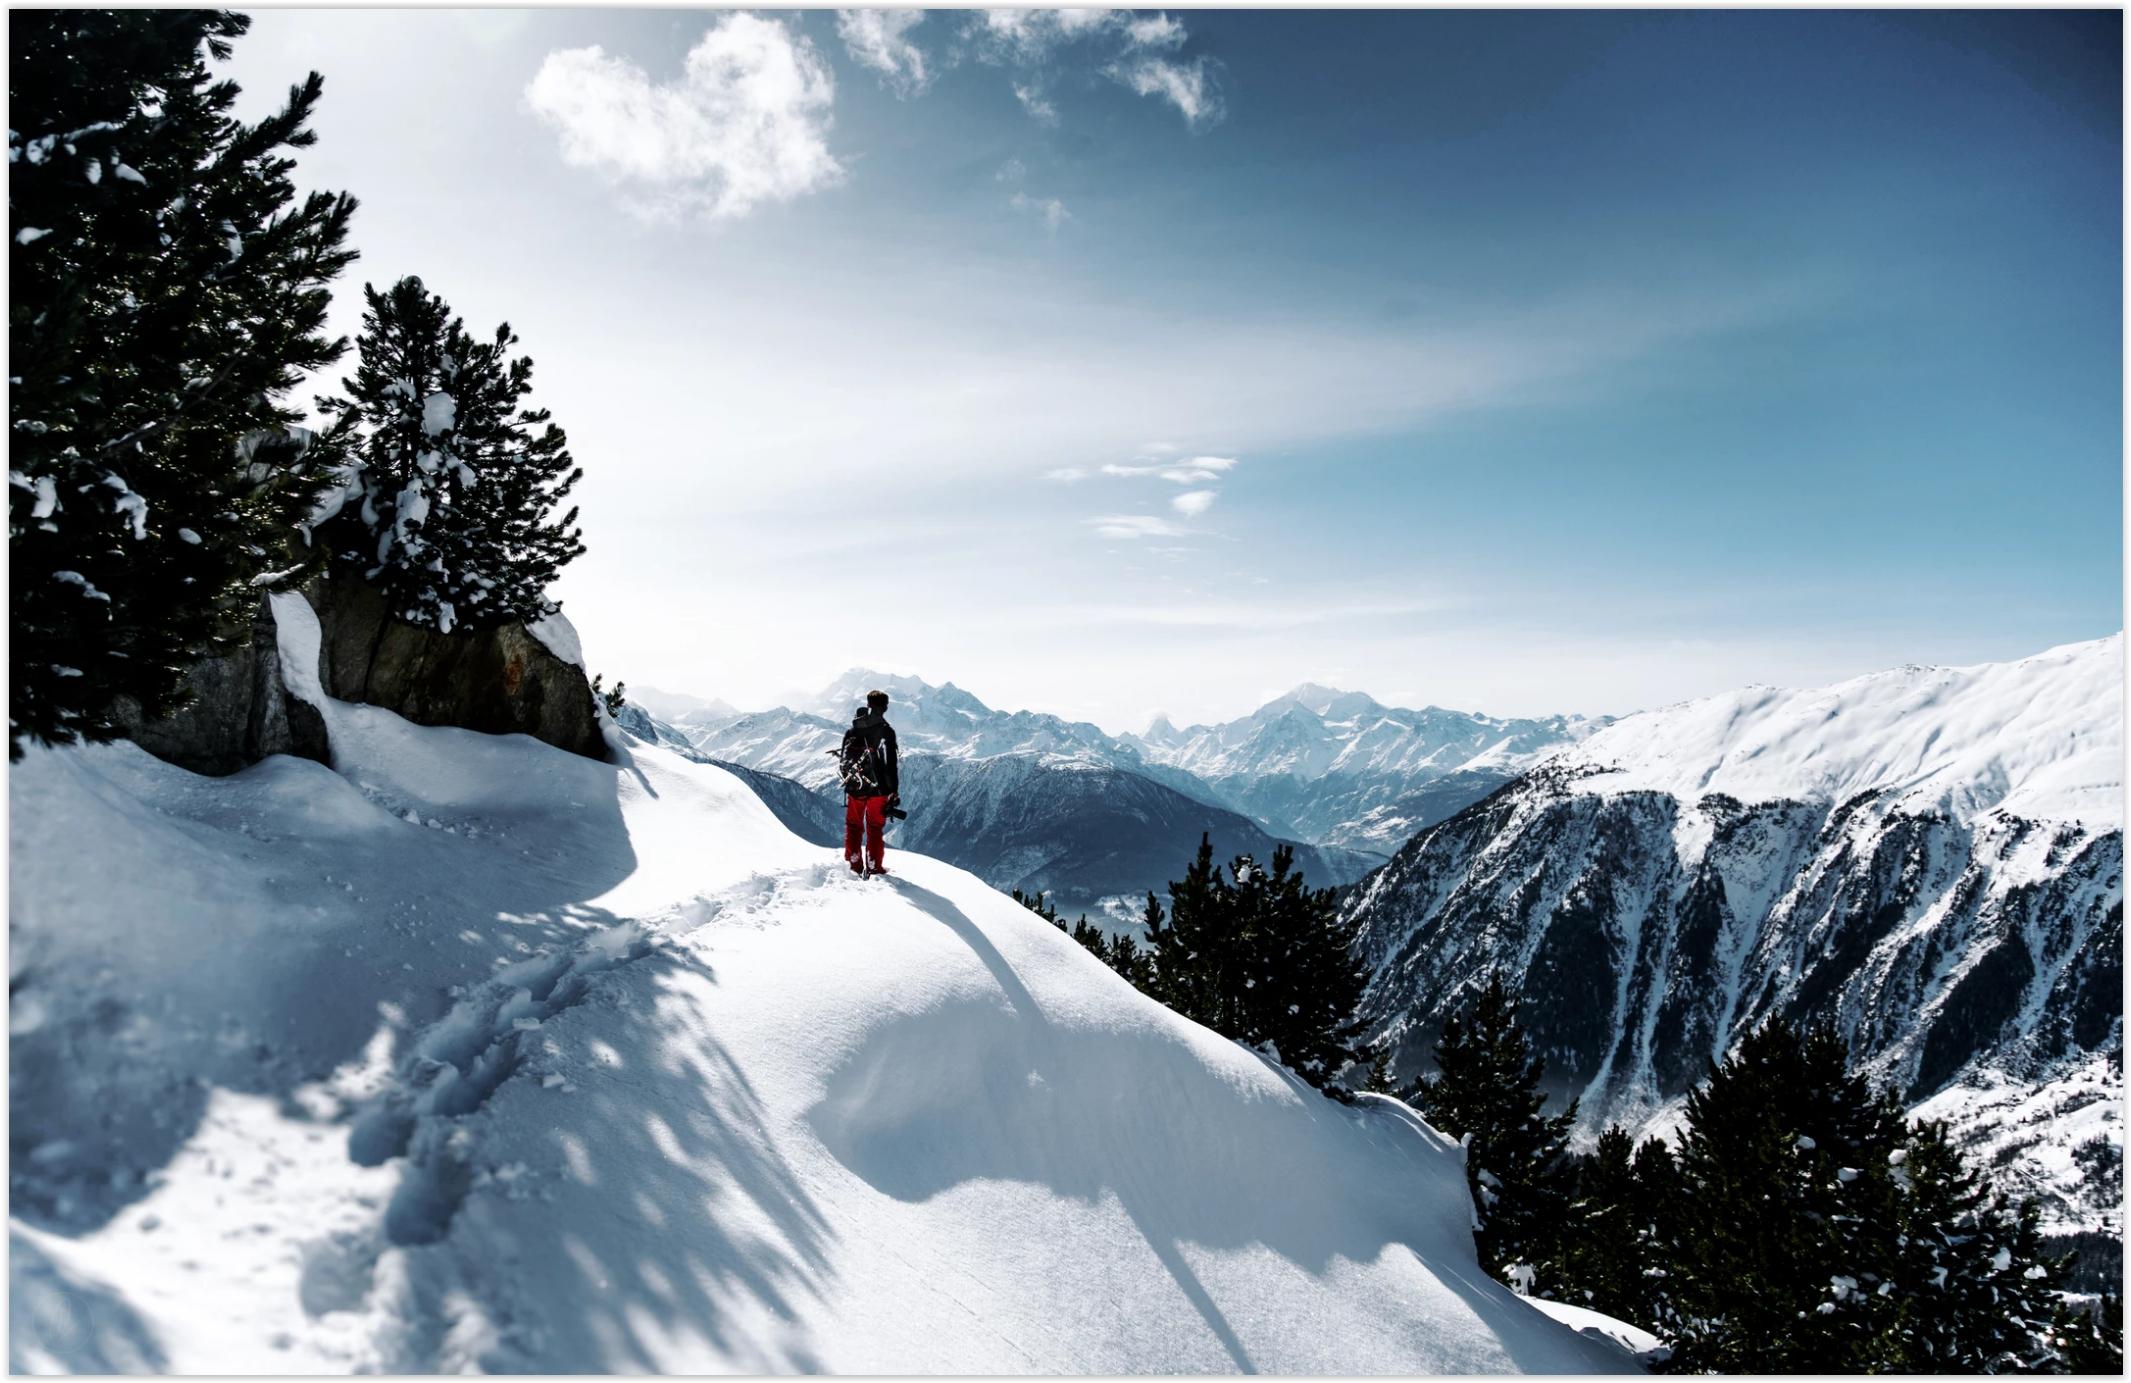 Snow Wanderer Beautiful Snowy Mountains Wallpaper Gadget State